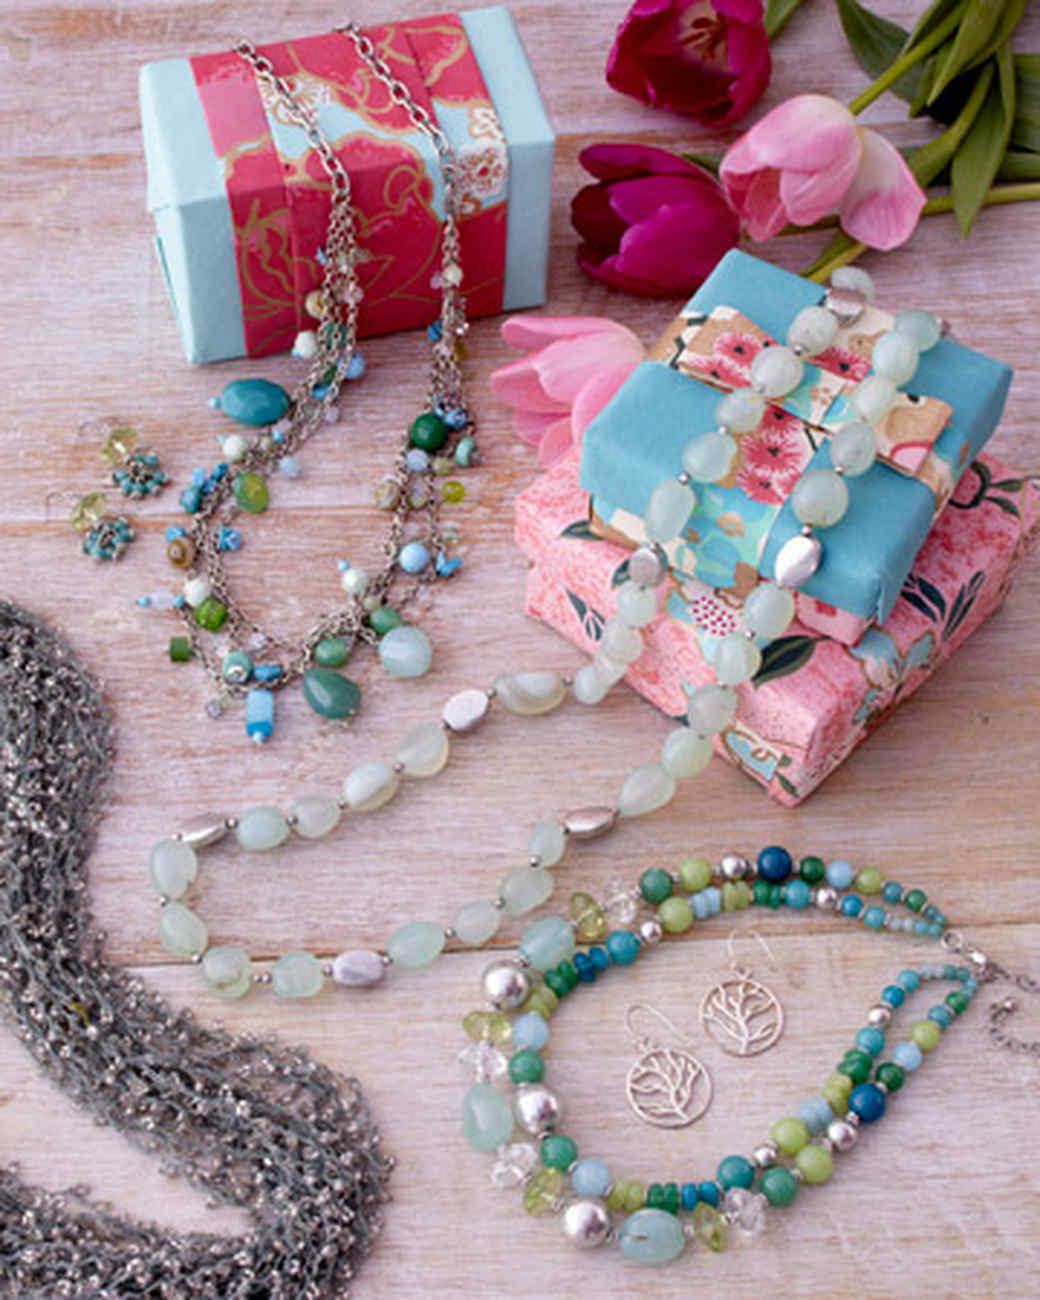 cpwm_mothersdayjewelry2_3.jpg